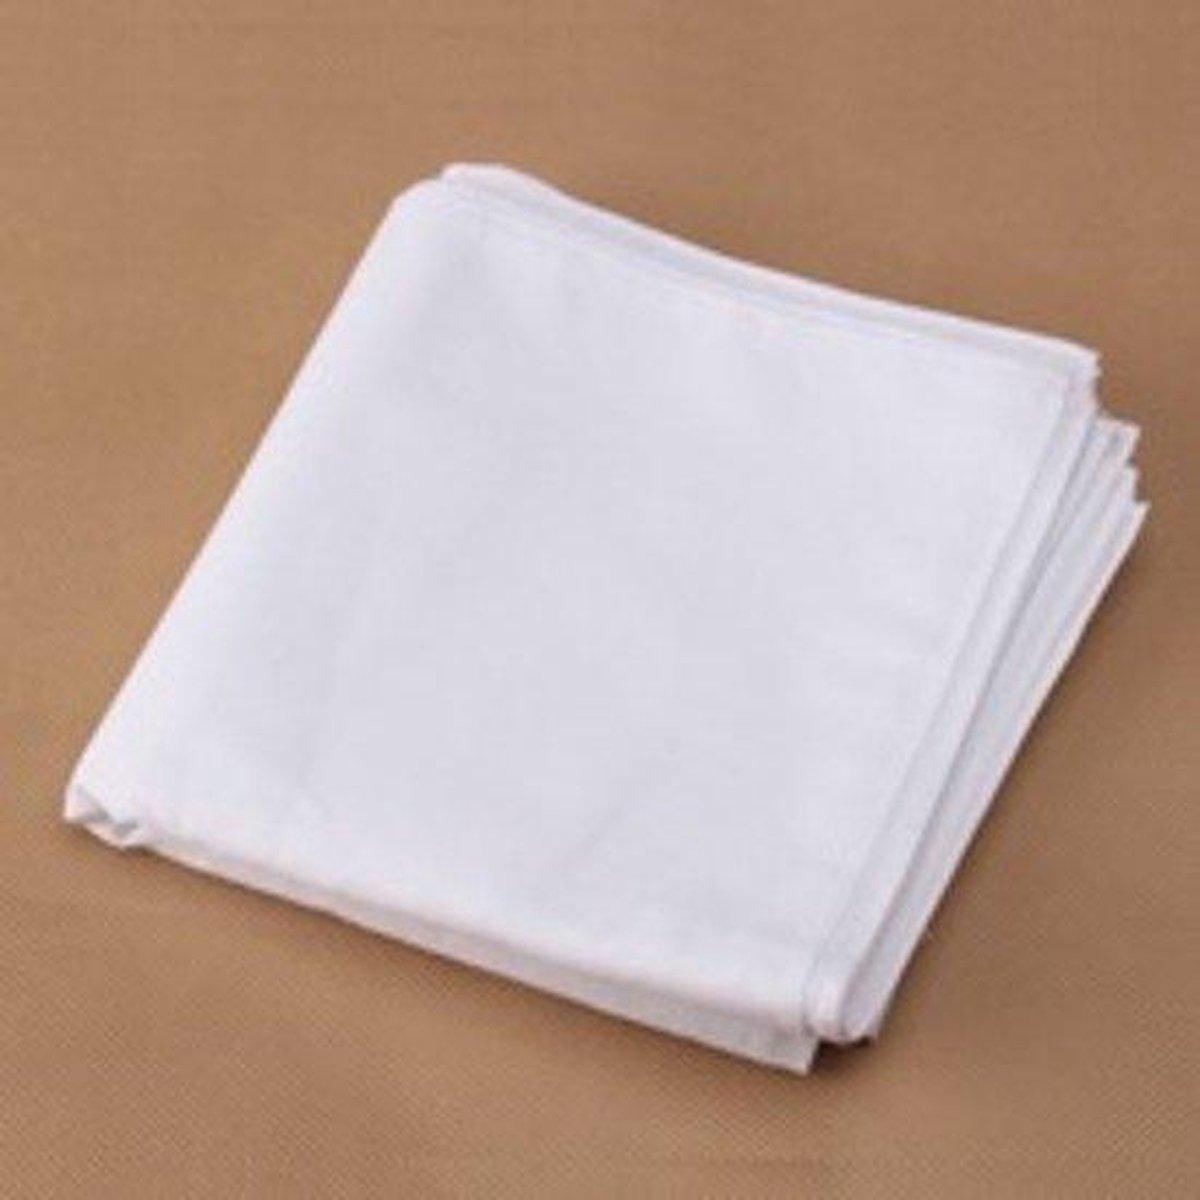 Zakdoeken - Wit - Set 6 stuks 37x37 cm Katoen